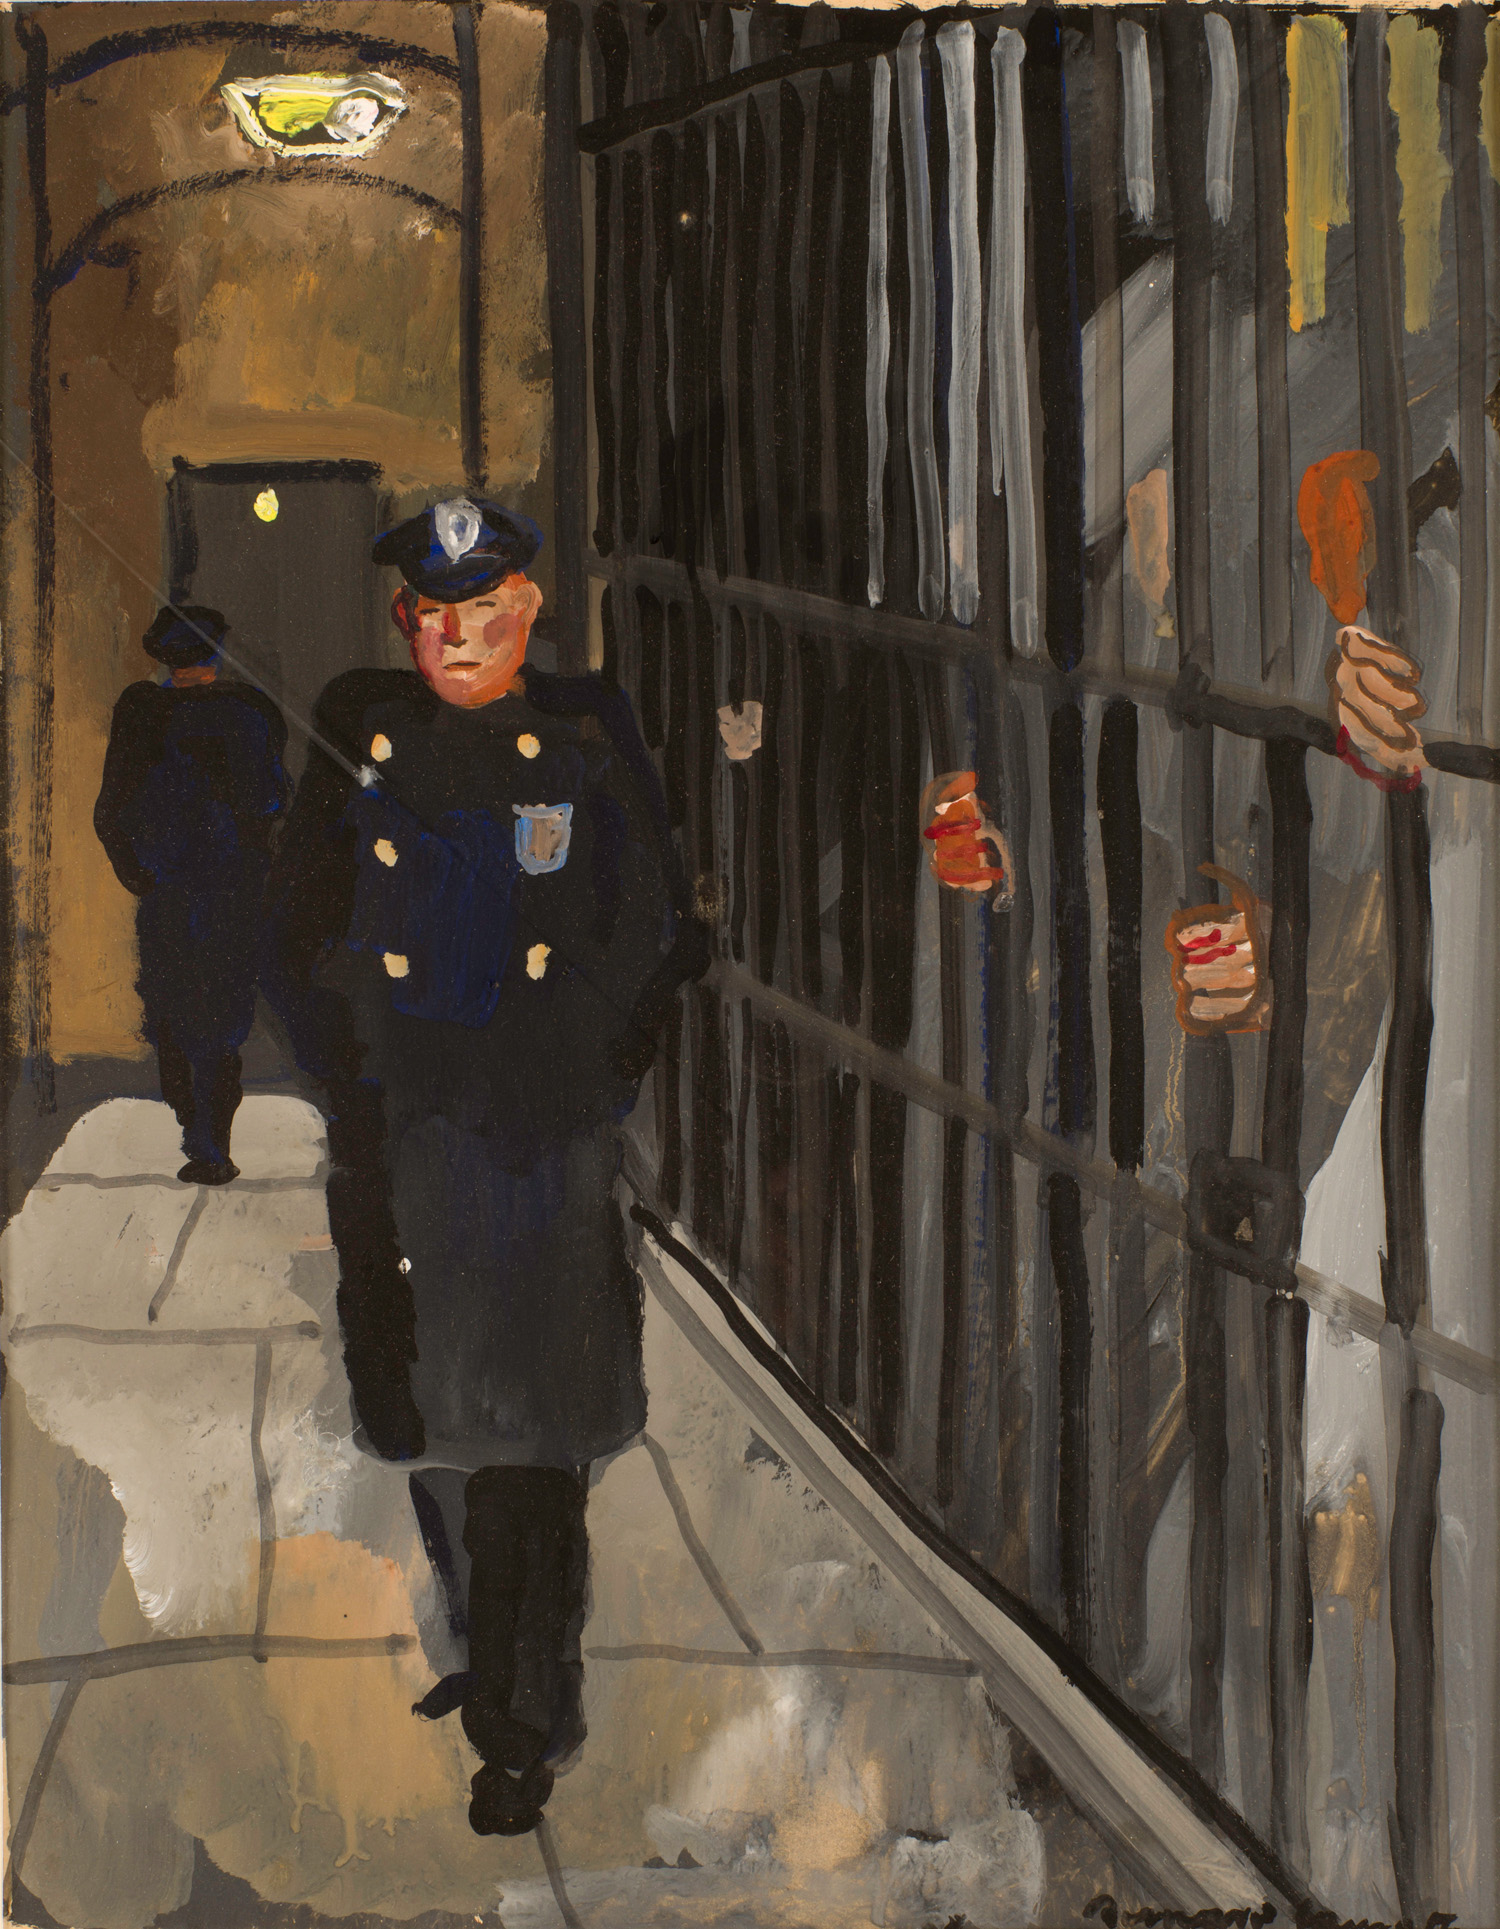 La prison | Anonyme | La Prison